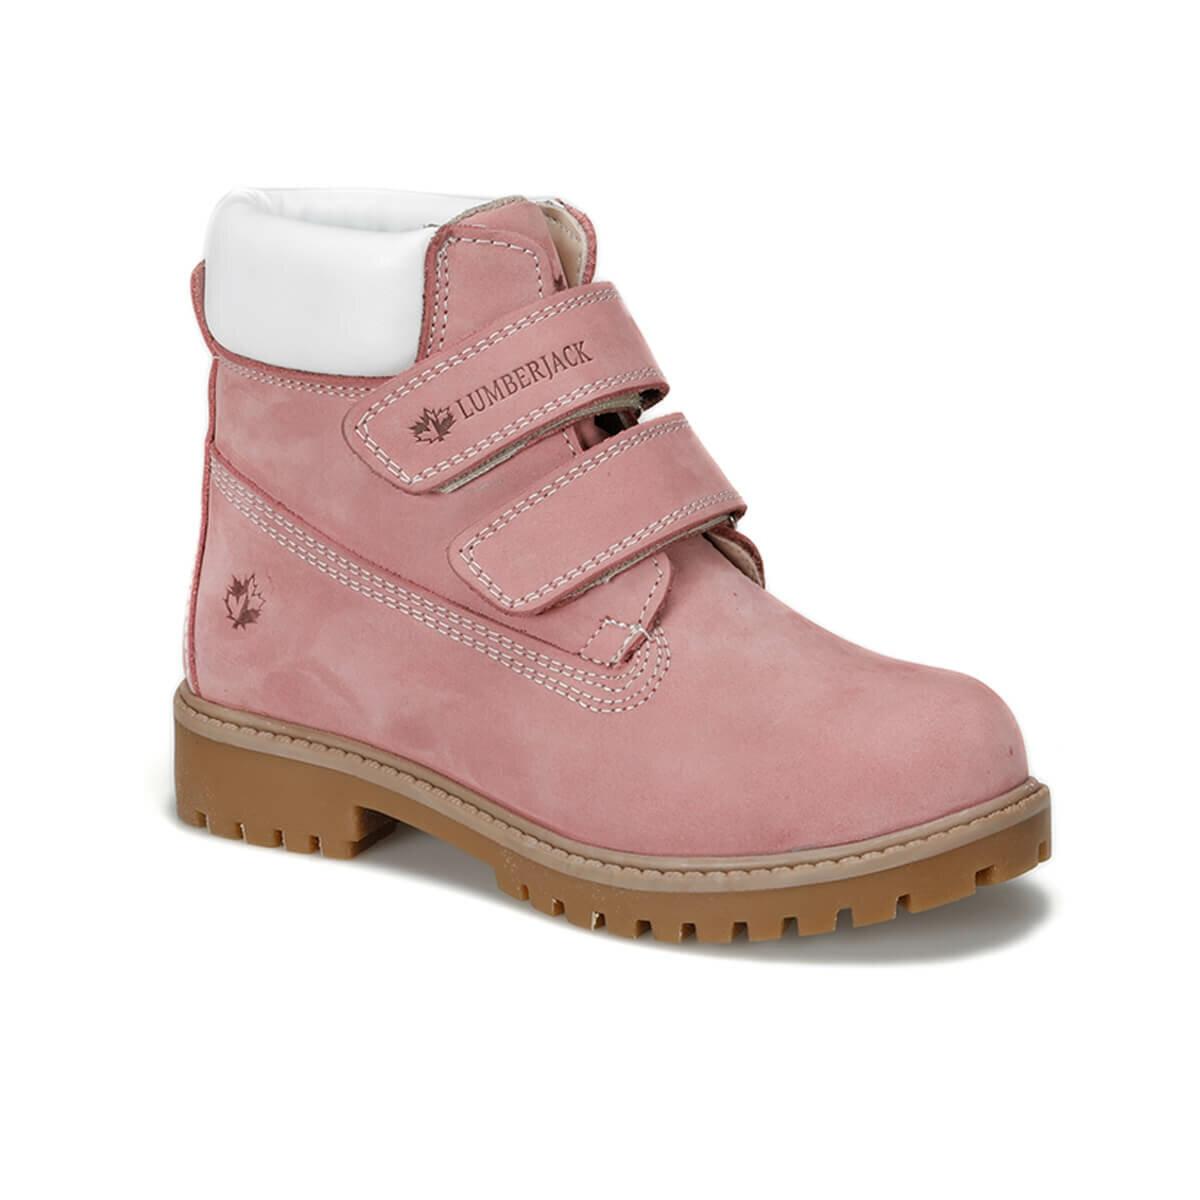 Flo Fiume 9PR Rosa Bambino Femminile Stivali Lumberjack